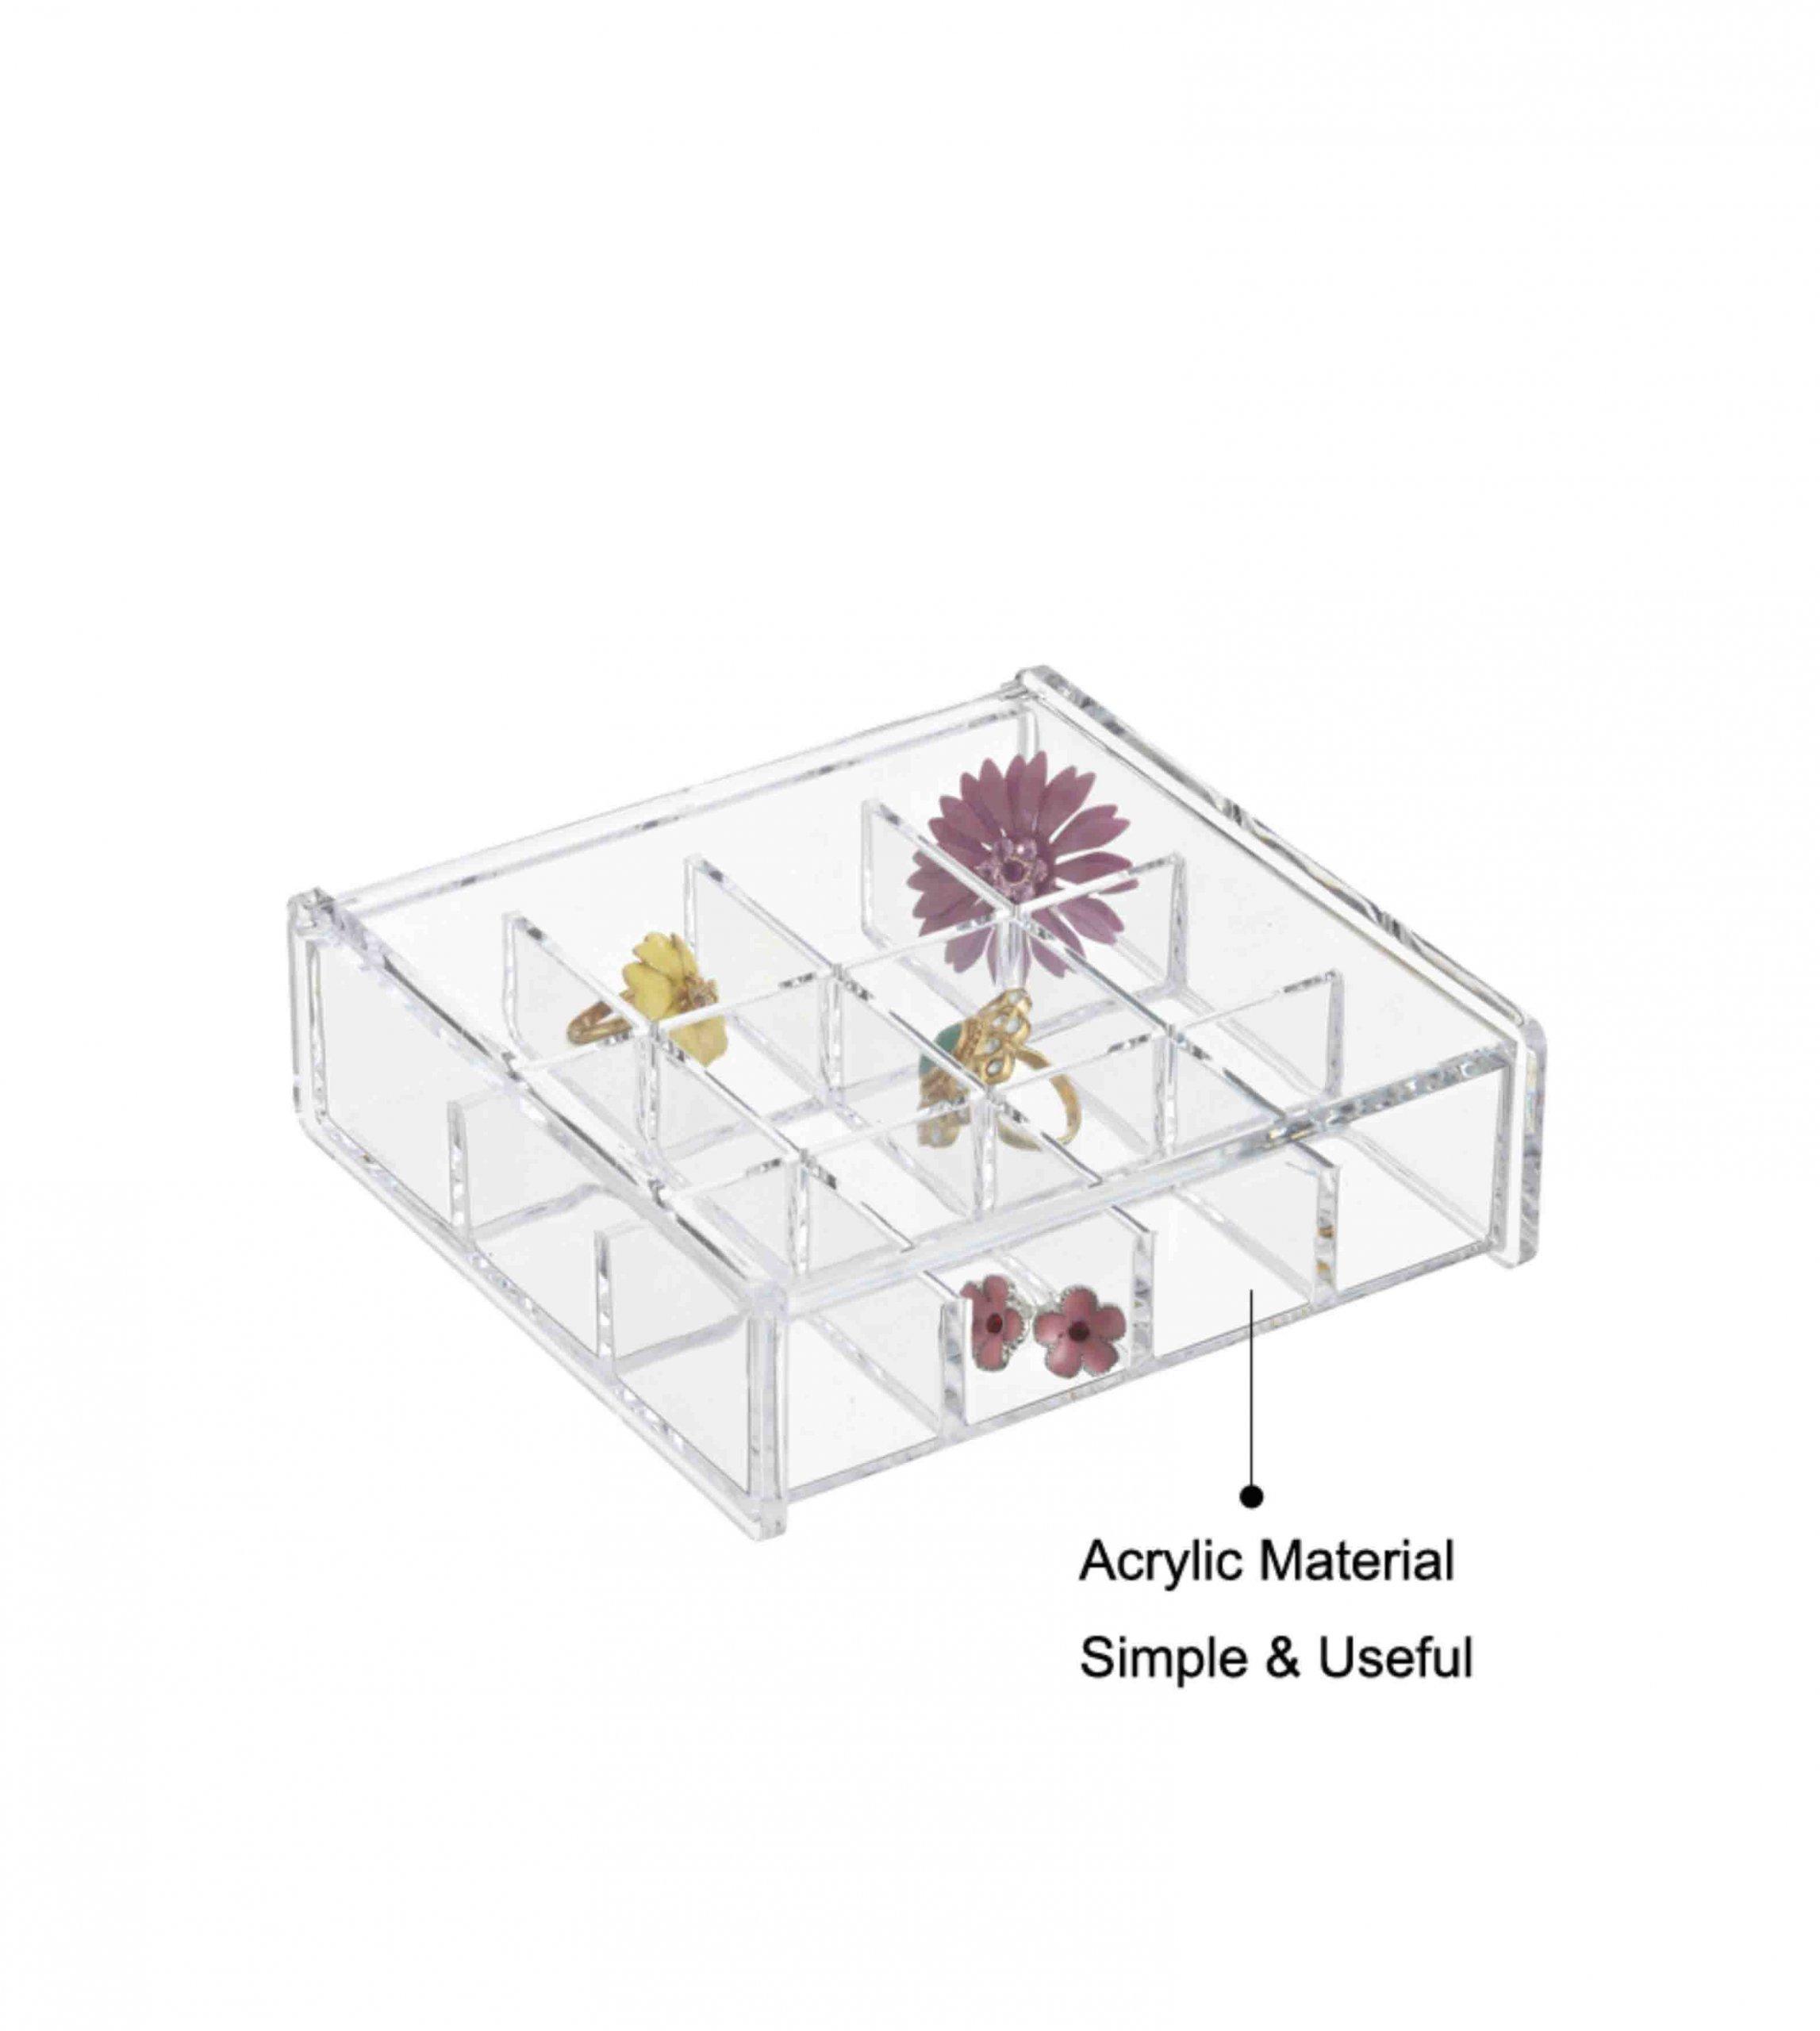 Acrylic Earring Storage Boxes HT1AdBVFKxaXXagOFbXp scaled